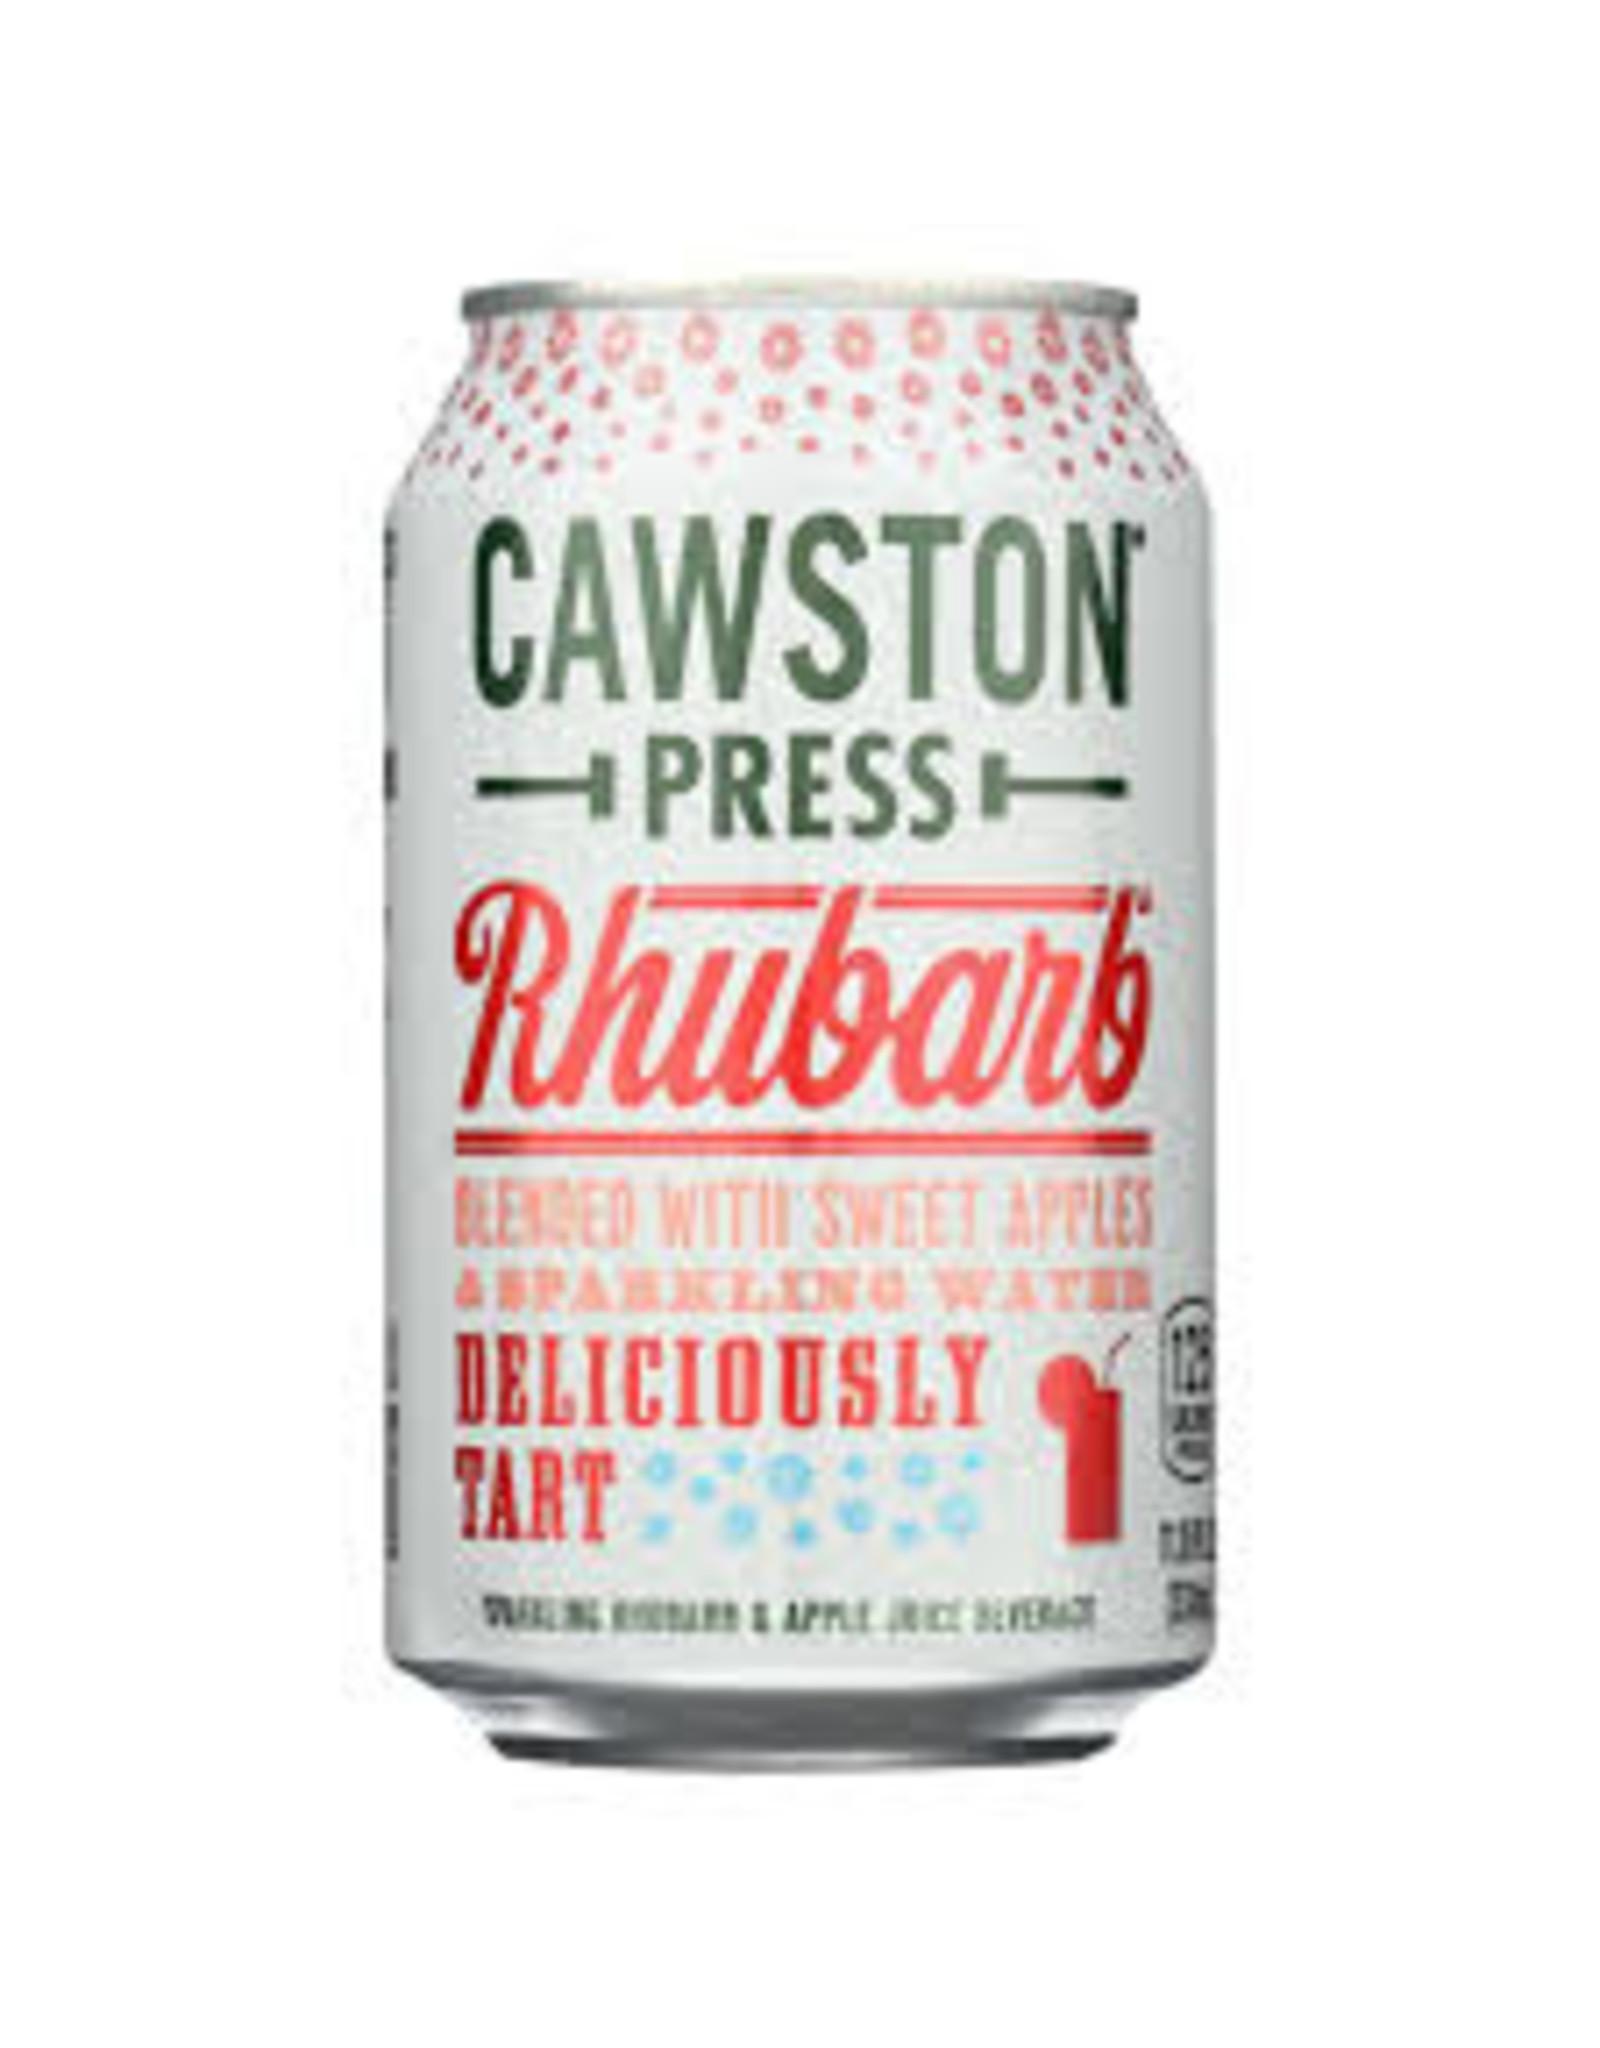 Cawston Cawston Press Sparkling Apple & Rhubarb